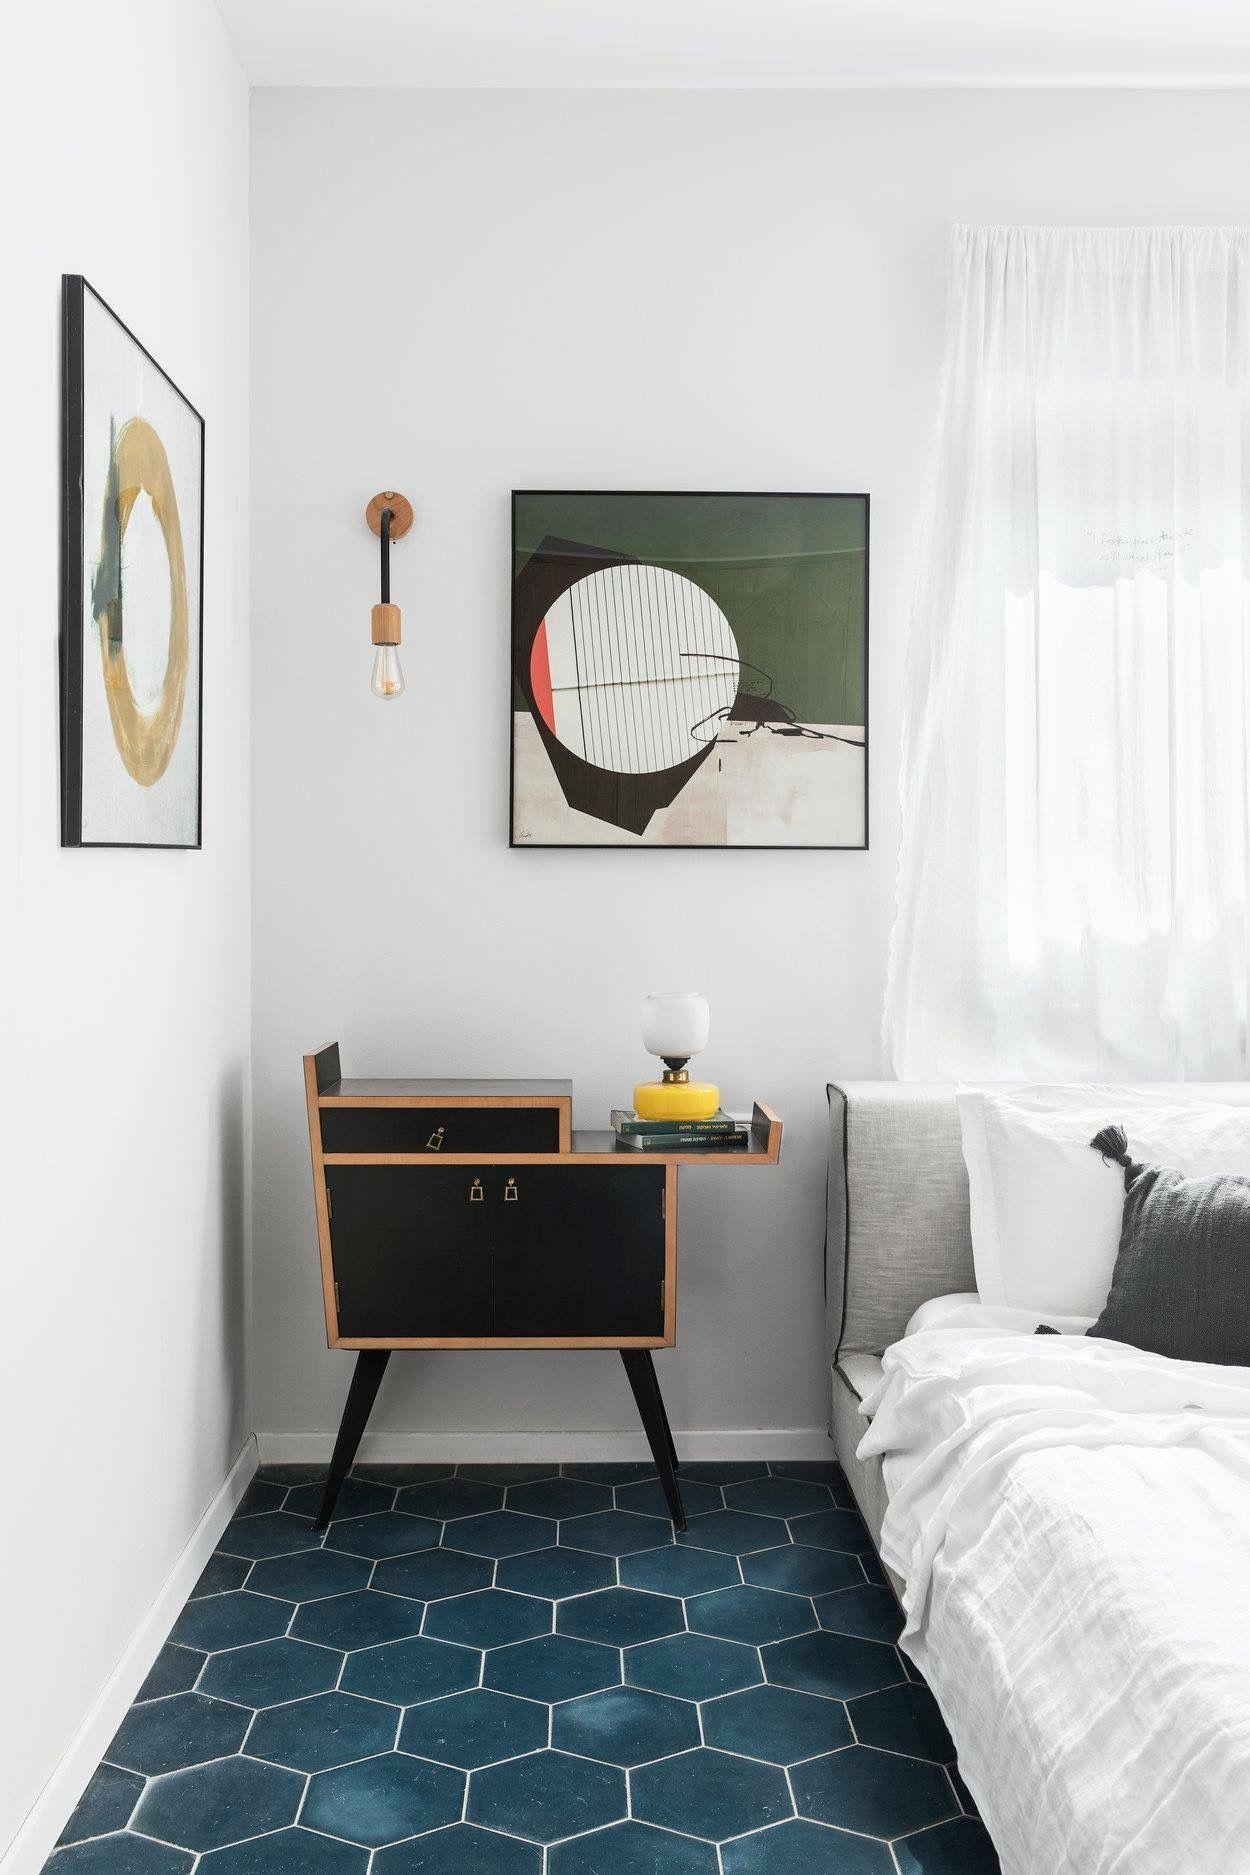 Pin By Tal Sapir On חדרי שינה Kids Rugs Home Decor Ideal